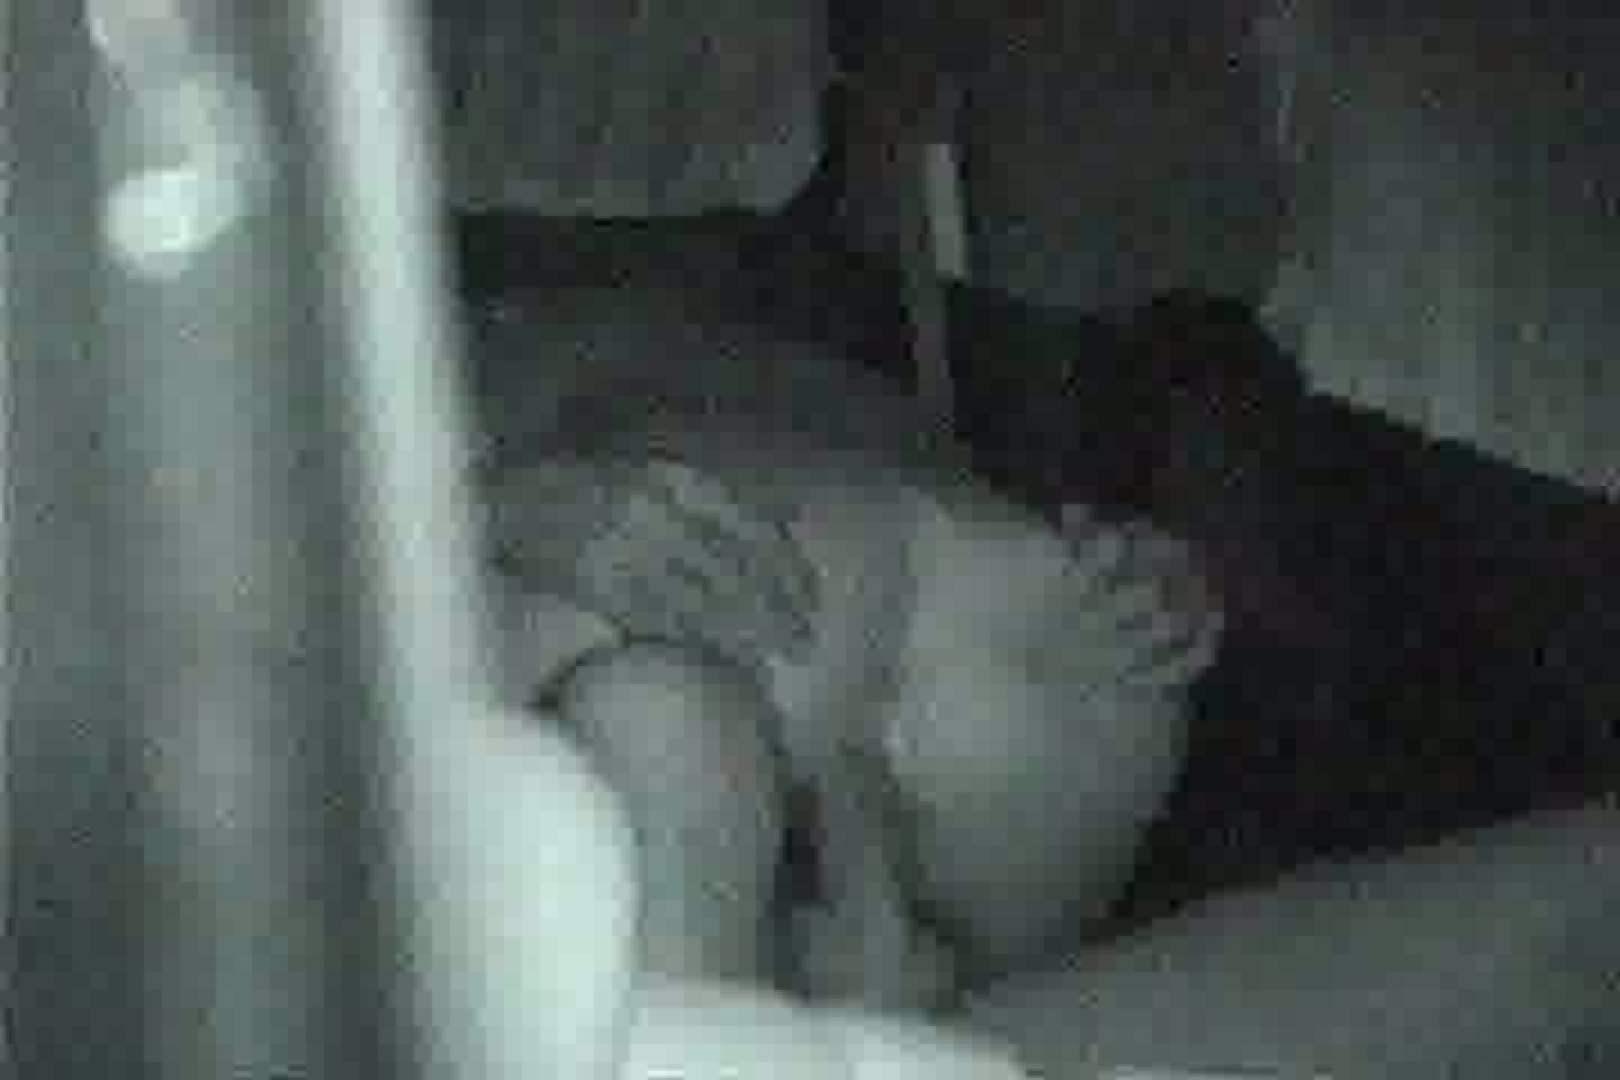 充血監督の深夜の運動会Vol.29 美乳 オメコ無修正動画無料 85pic 48